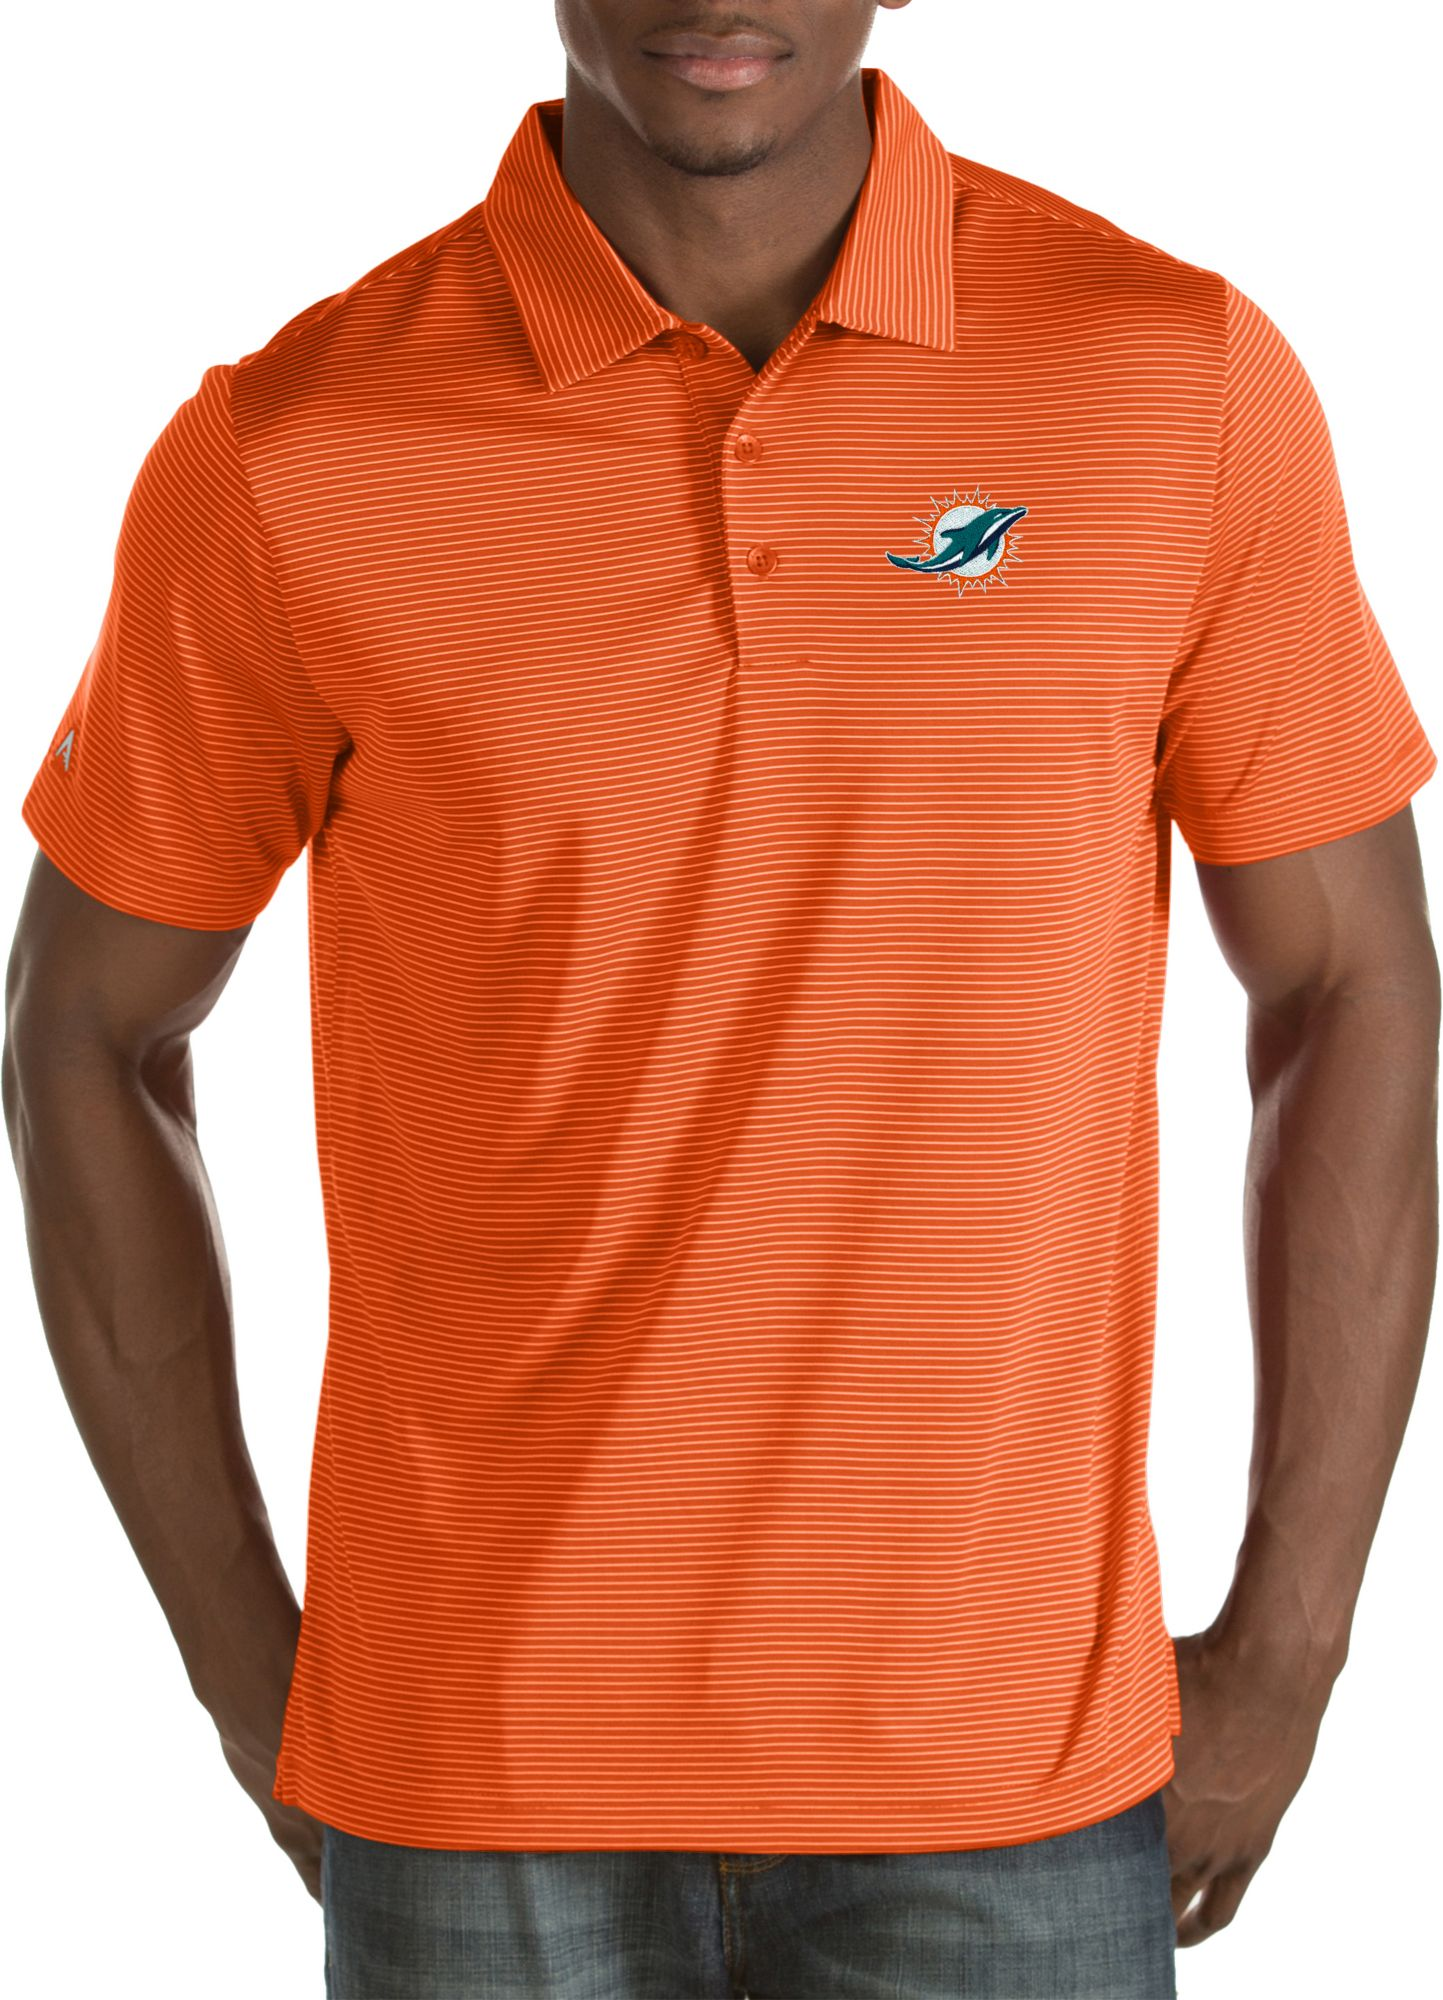 5341ce615 Miami Dolphins Polo Shirts